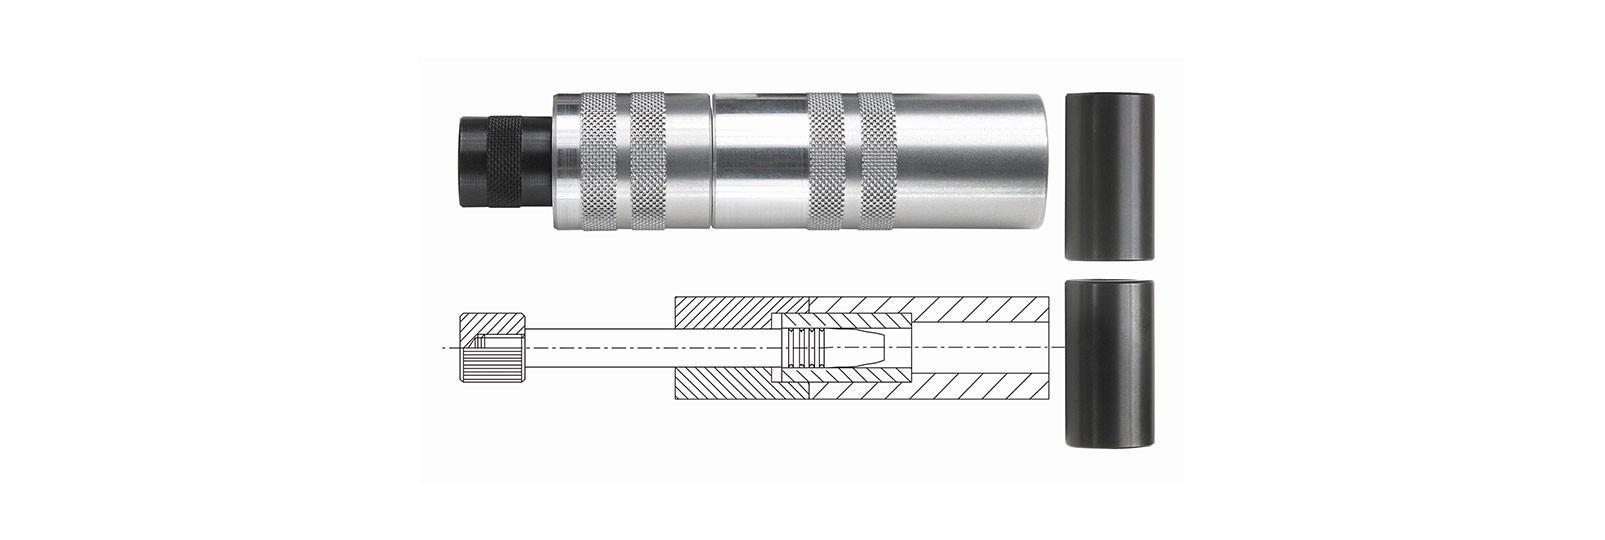 Bullet sizer maxi